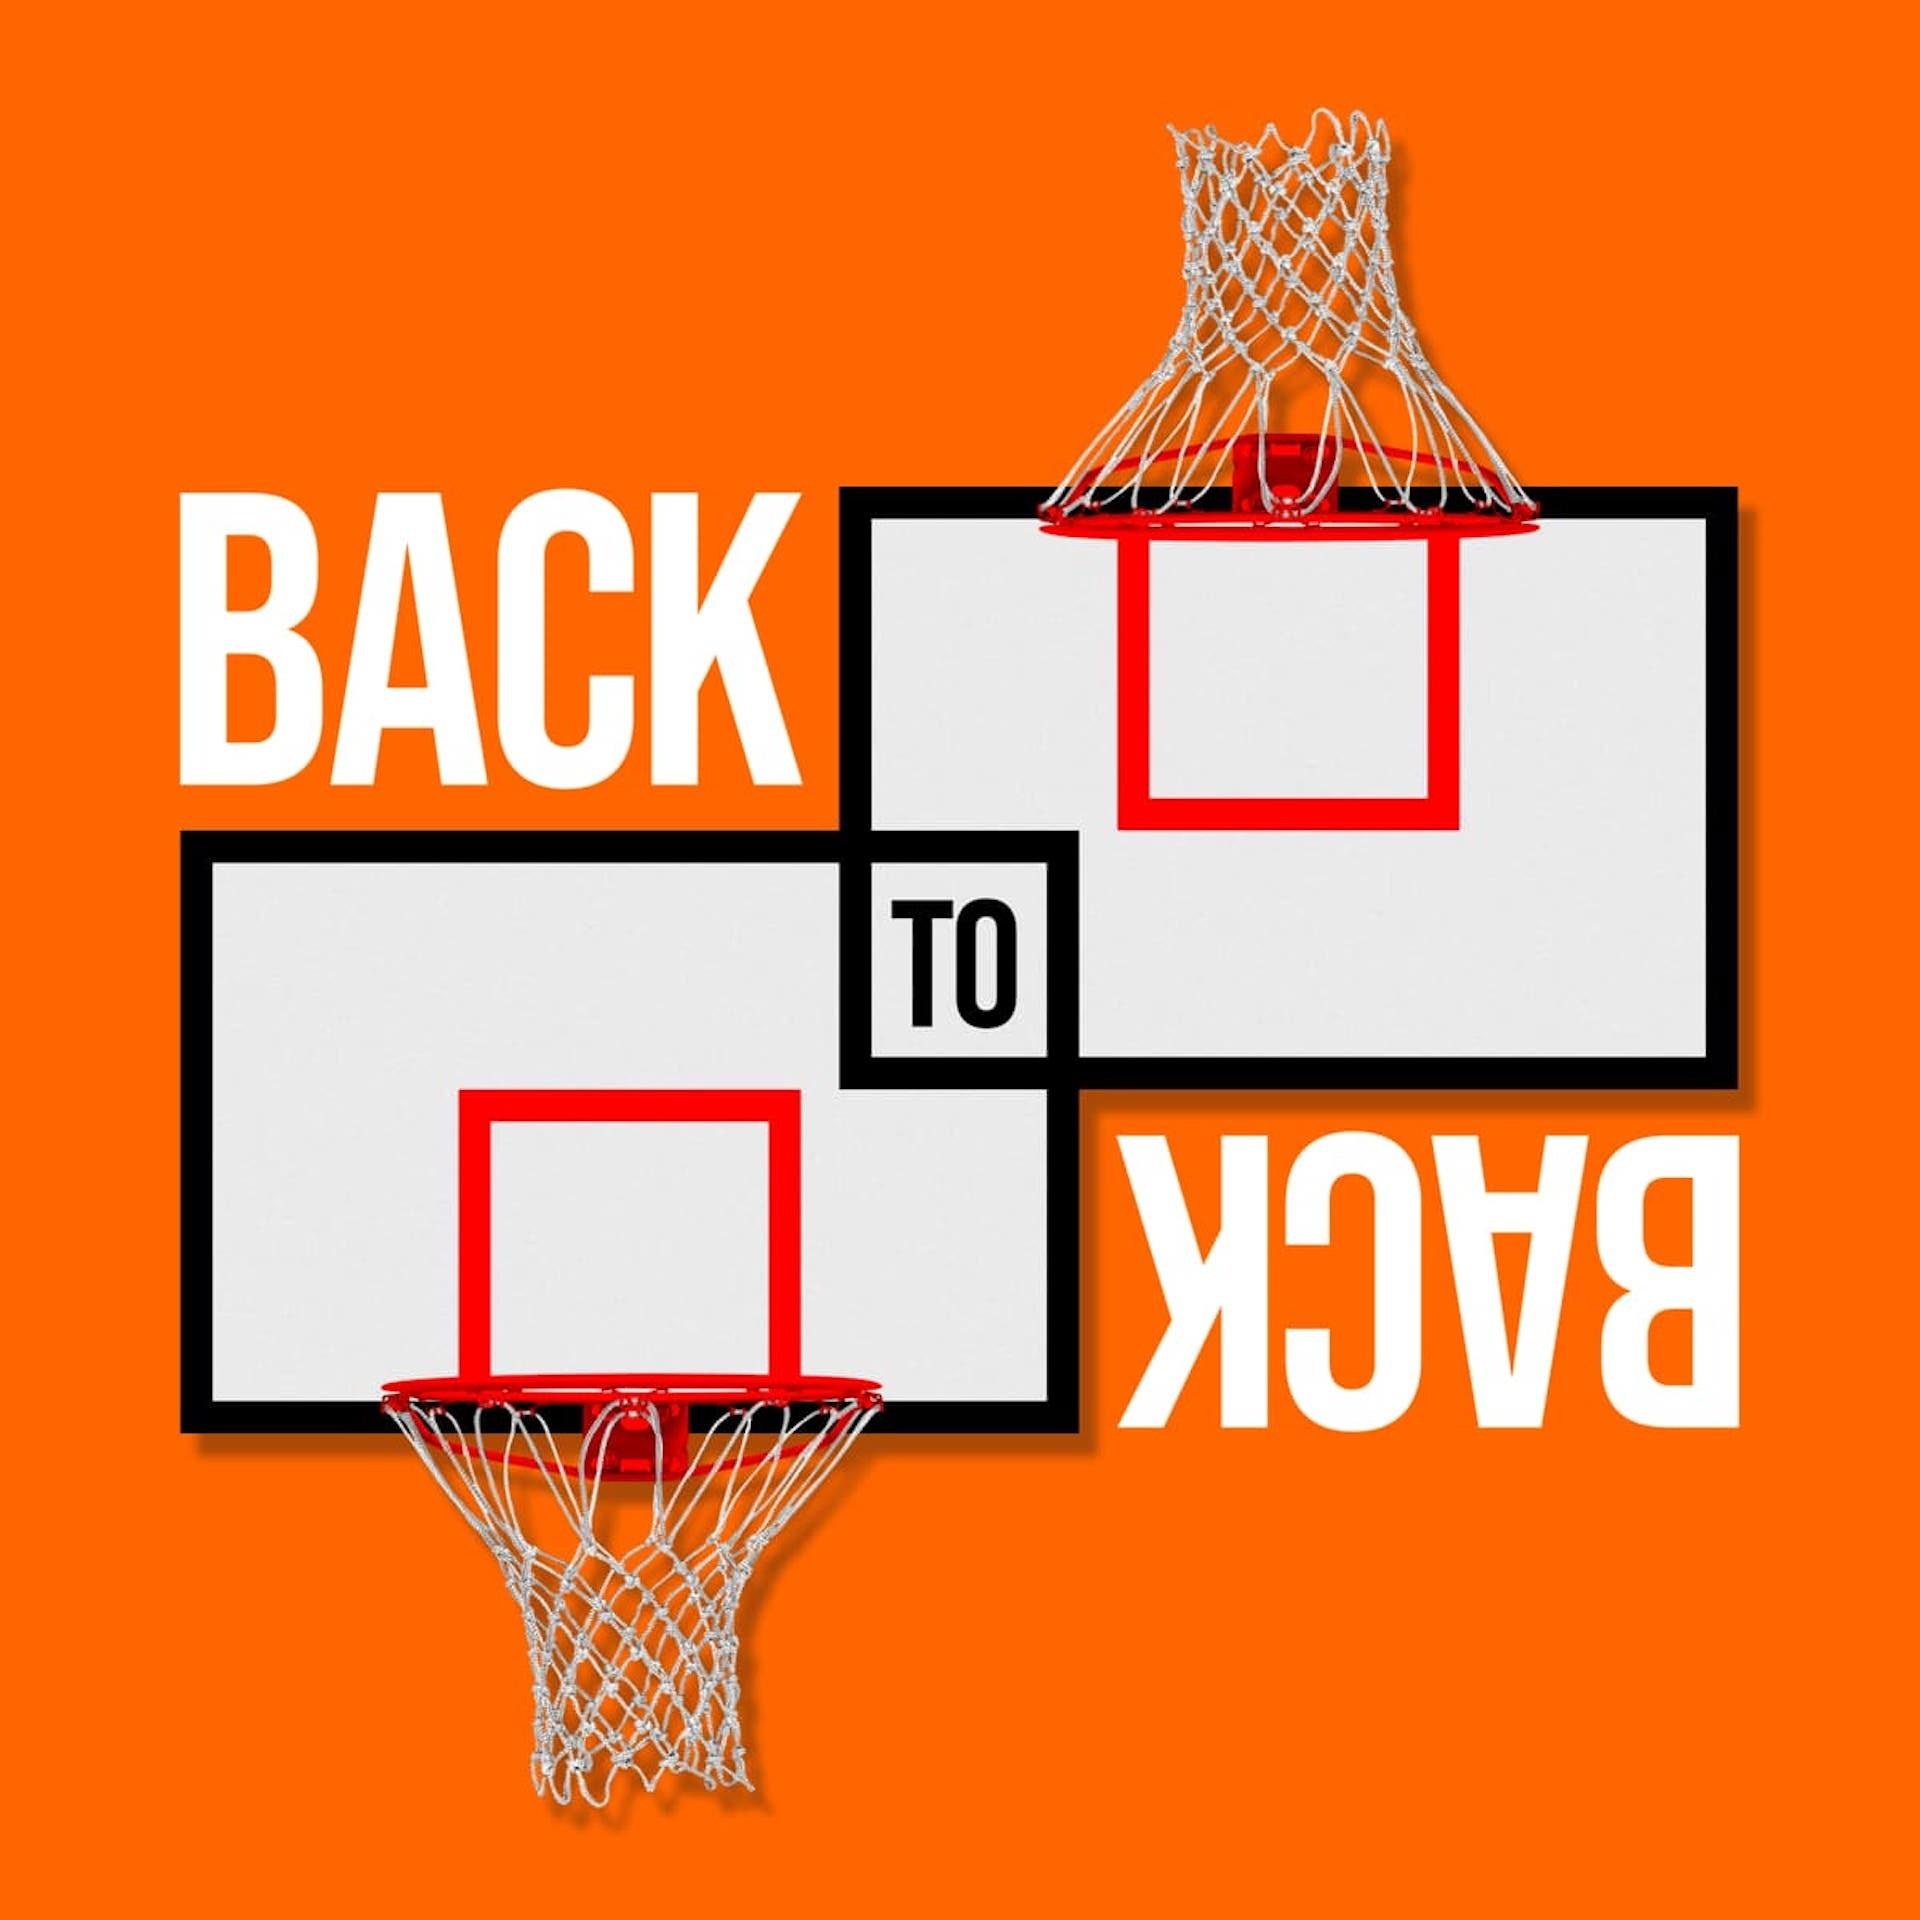 BasketBall Buds: Buzzer Beaters, Banana Hands, CP3 vs Russ, Ratings Myths